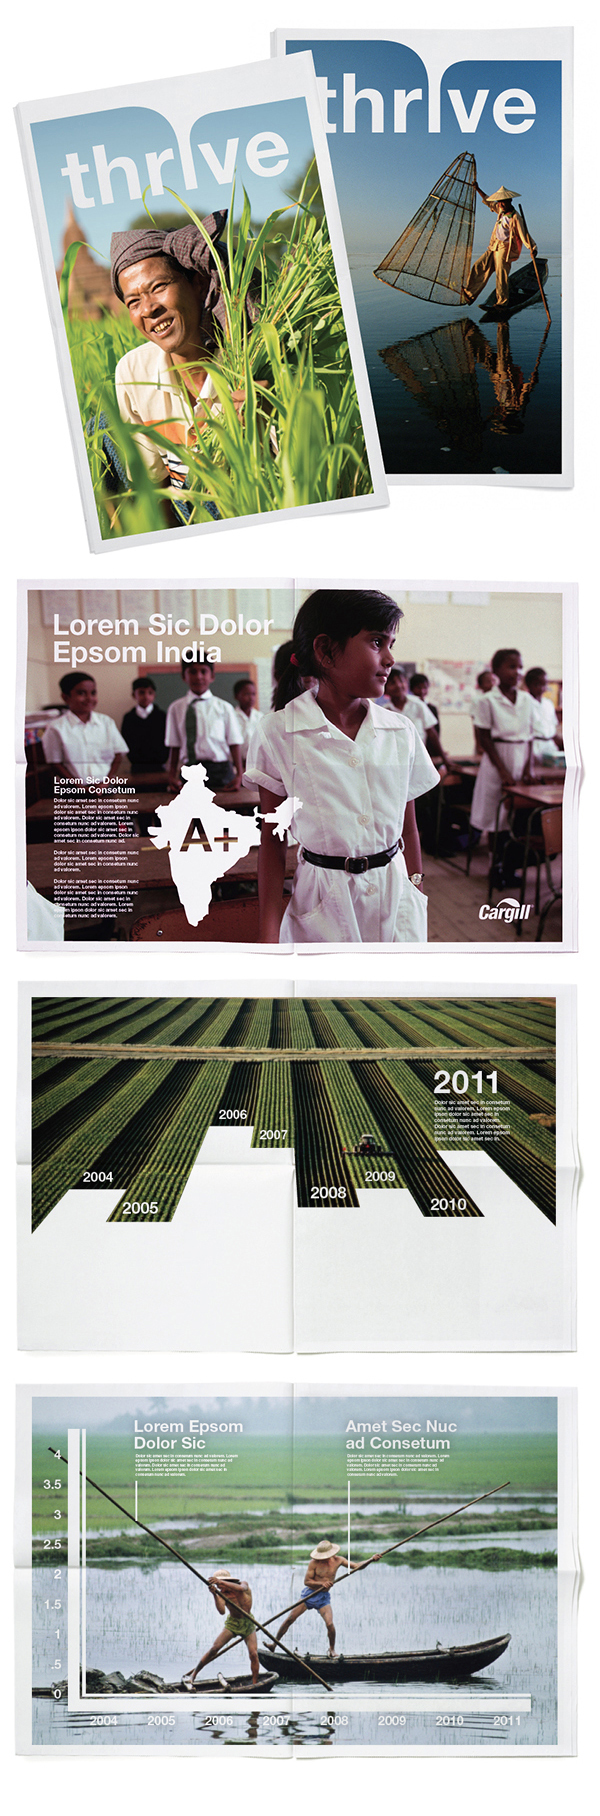 Cargill Brand Expression by Kyle Hames, via Behance